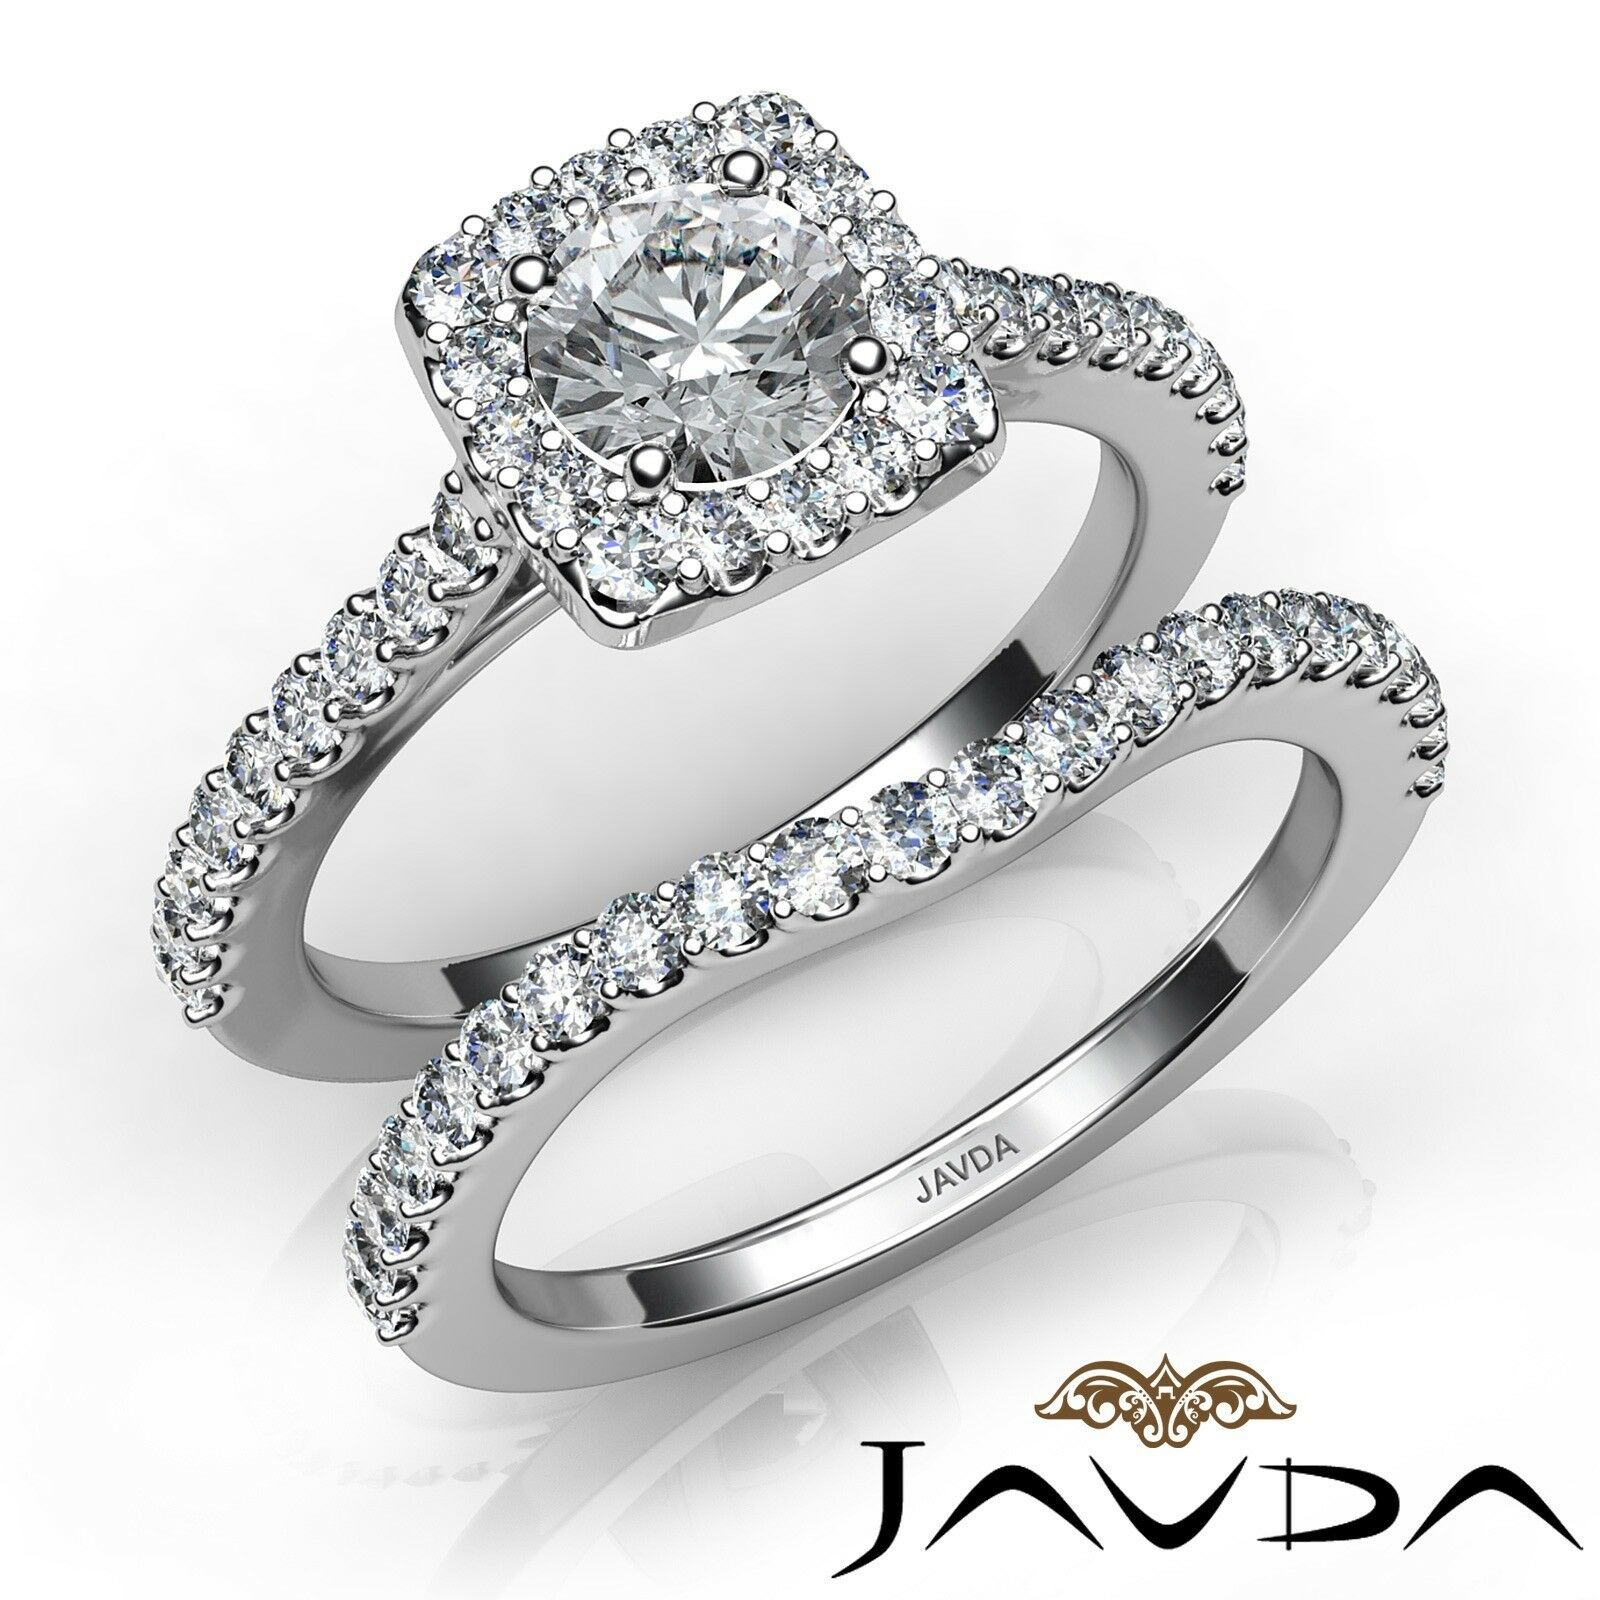 1.7ctw Halo U Prong Bridal Set Round Diamond Engagement Ring GIA G-VVS2 W Gold